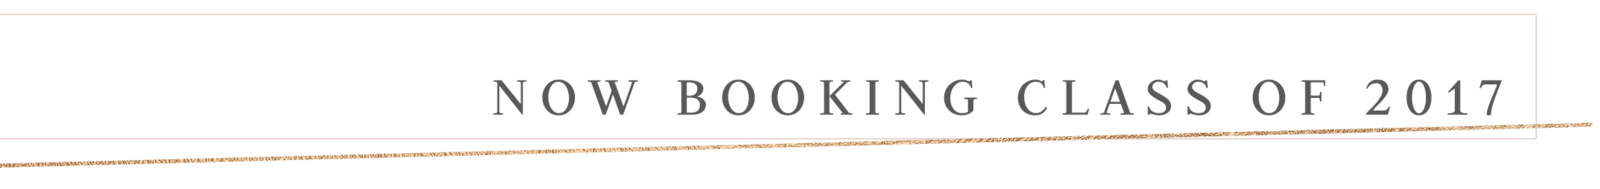 senior_booking